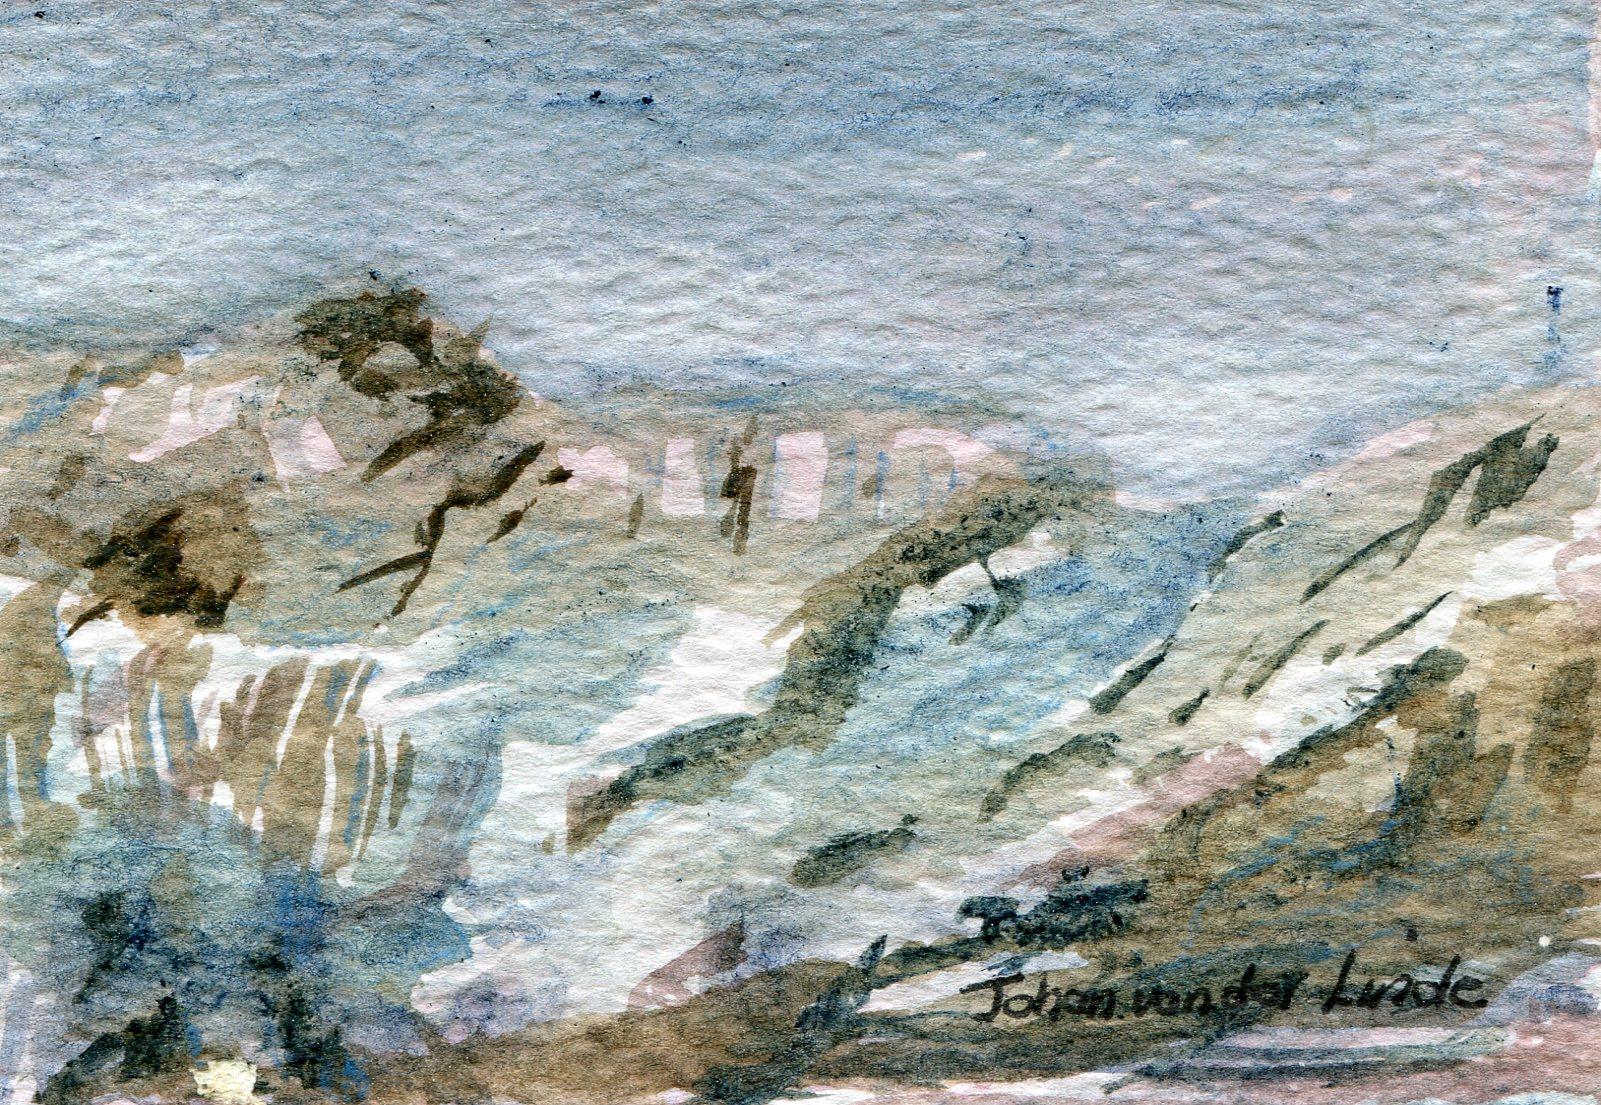 40a  Johan van der Linde  The Berg  watercolour on paper